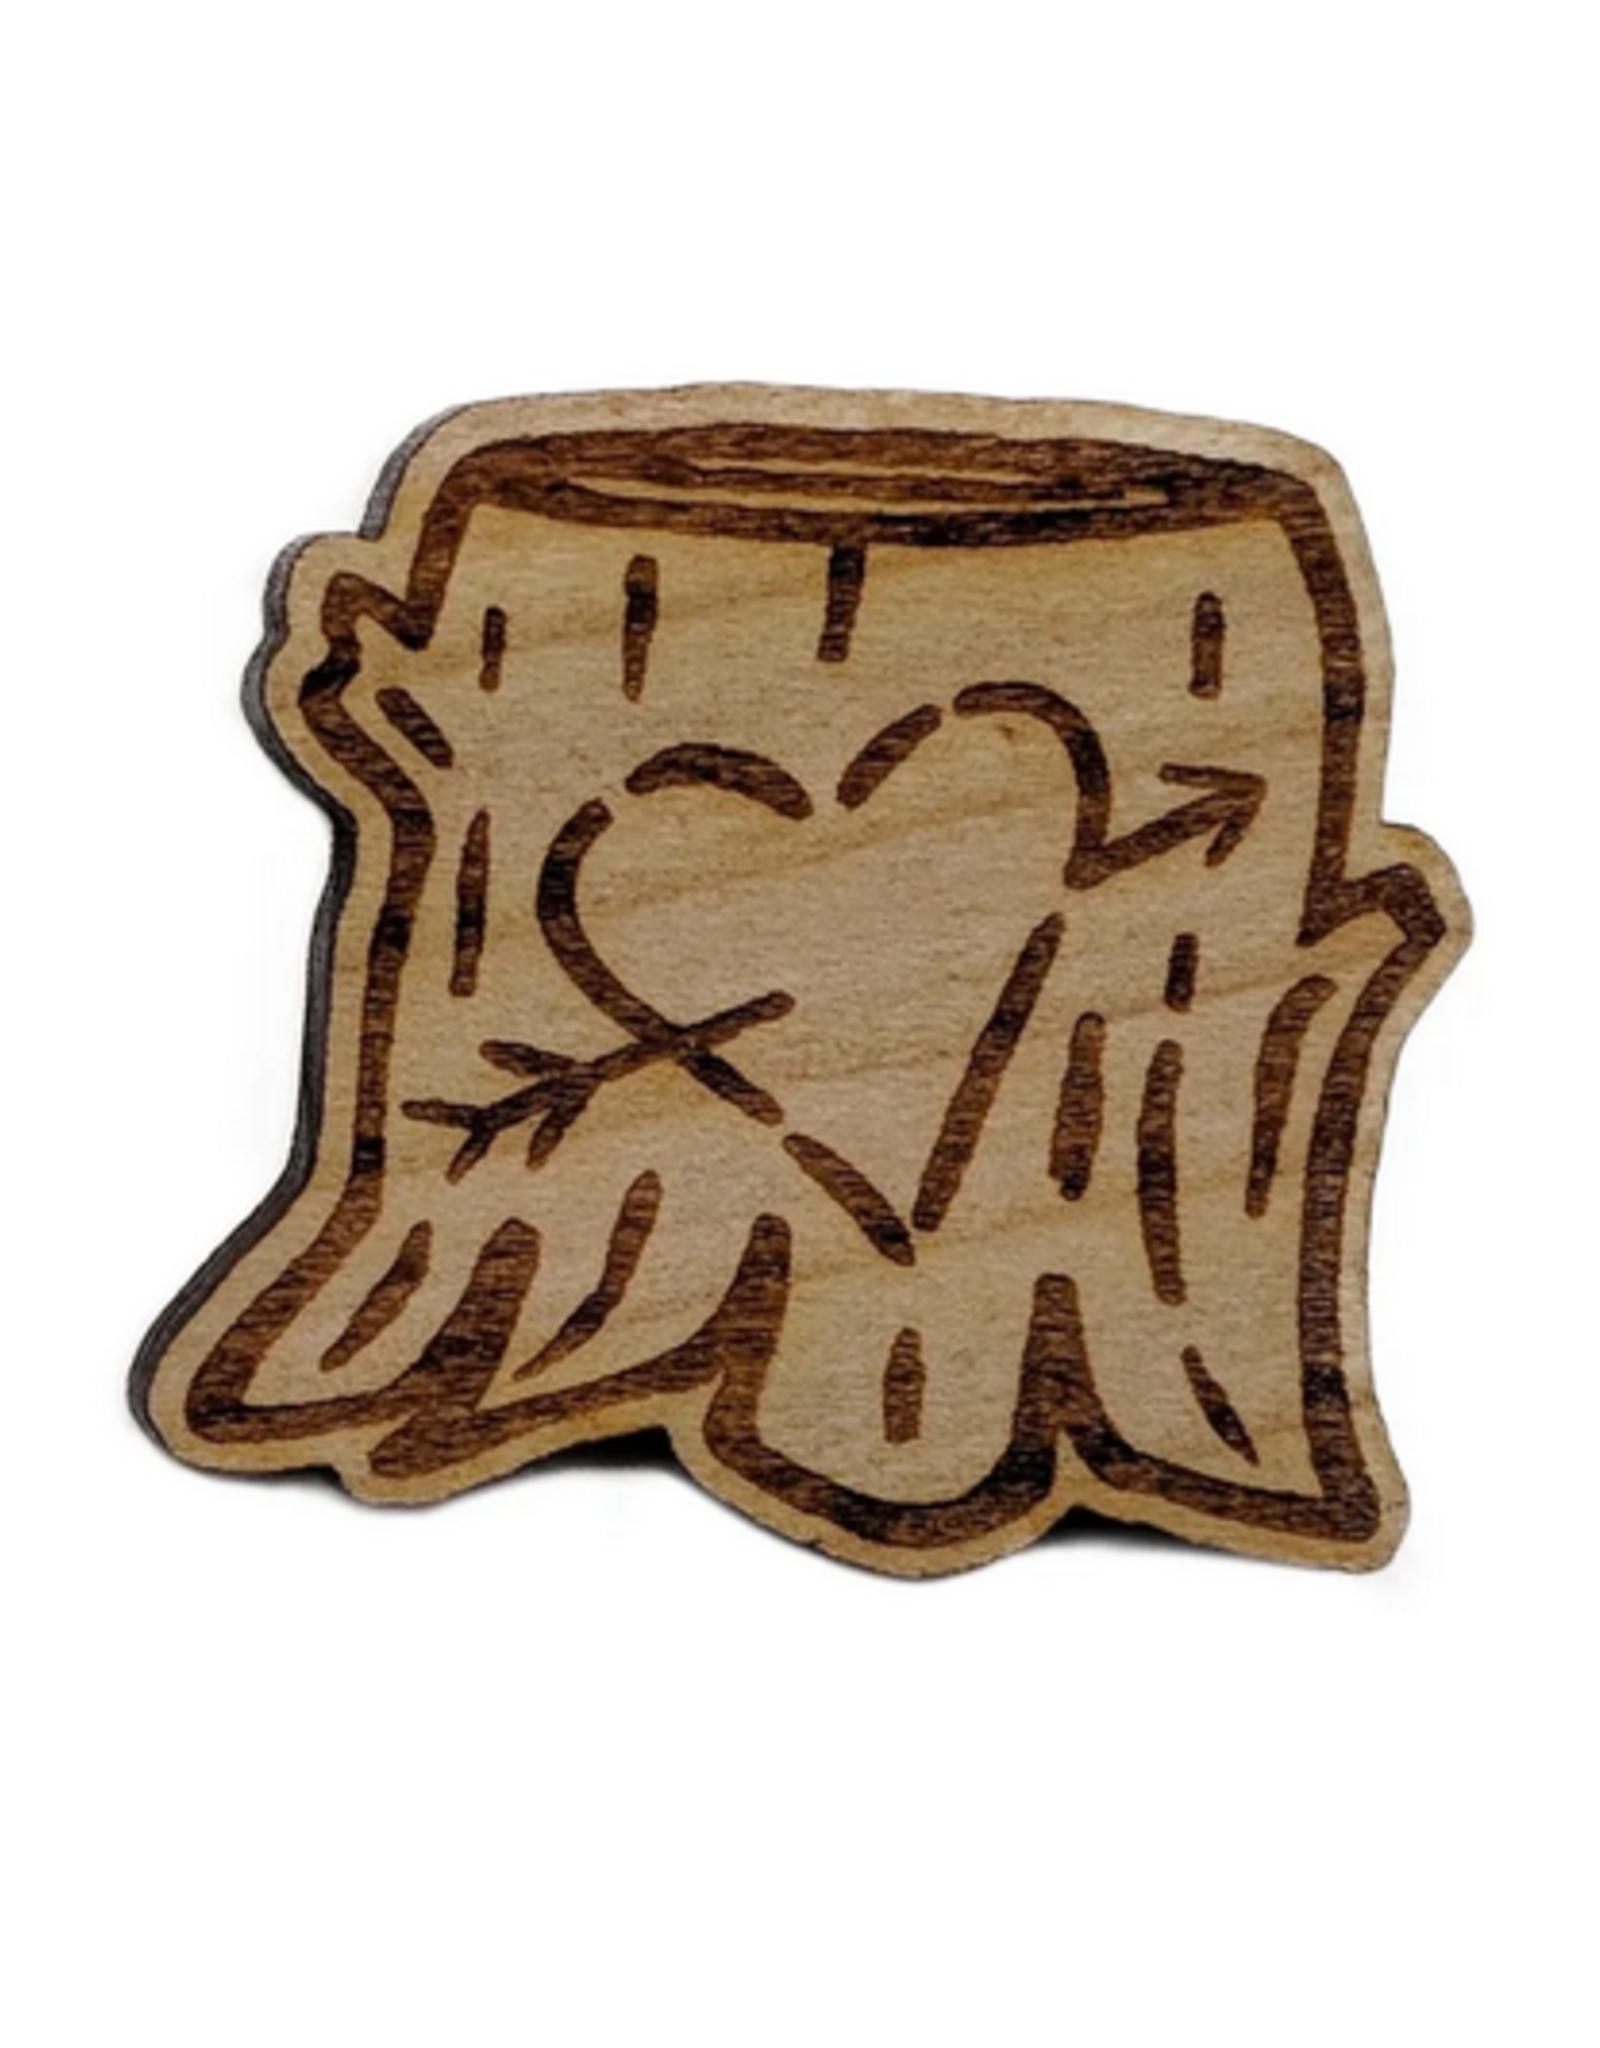 Brandy Bingham Carved Heart Stump Enamel Pin